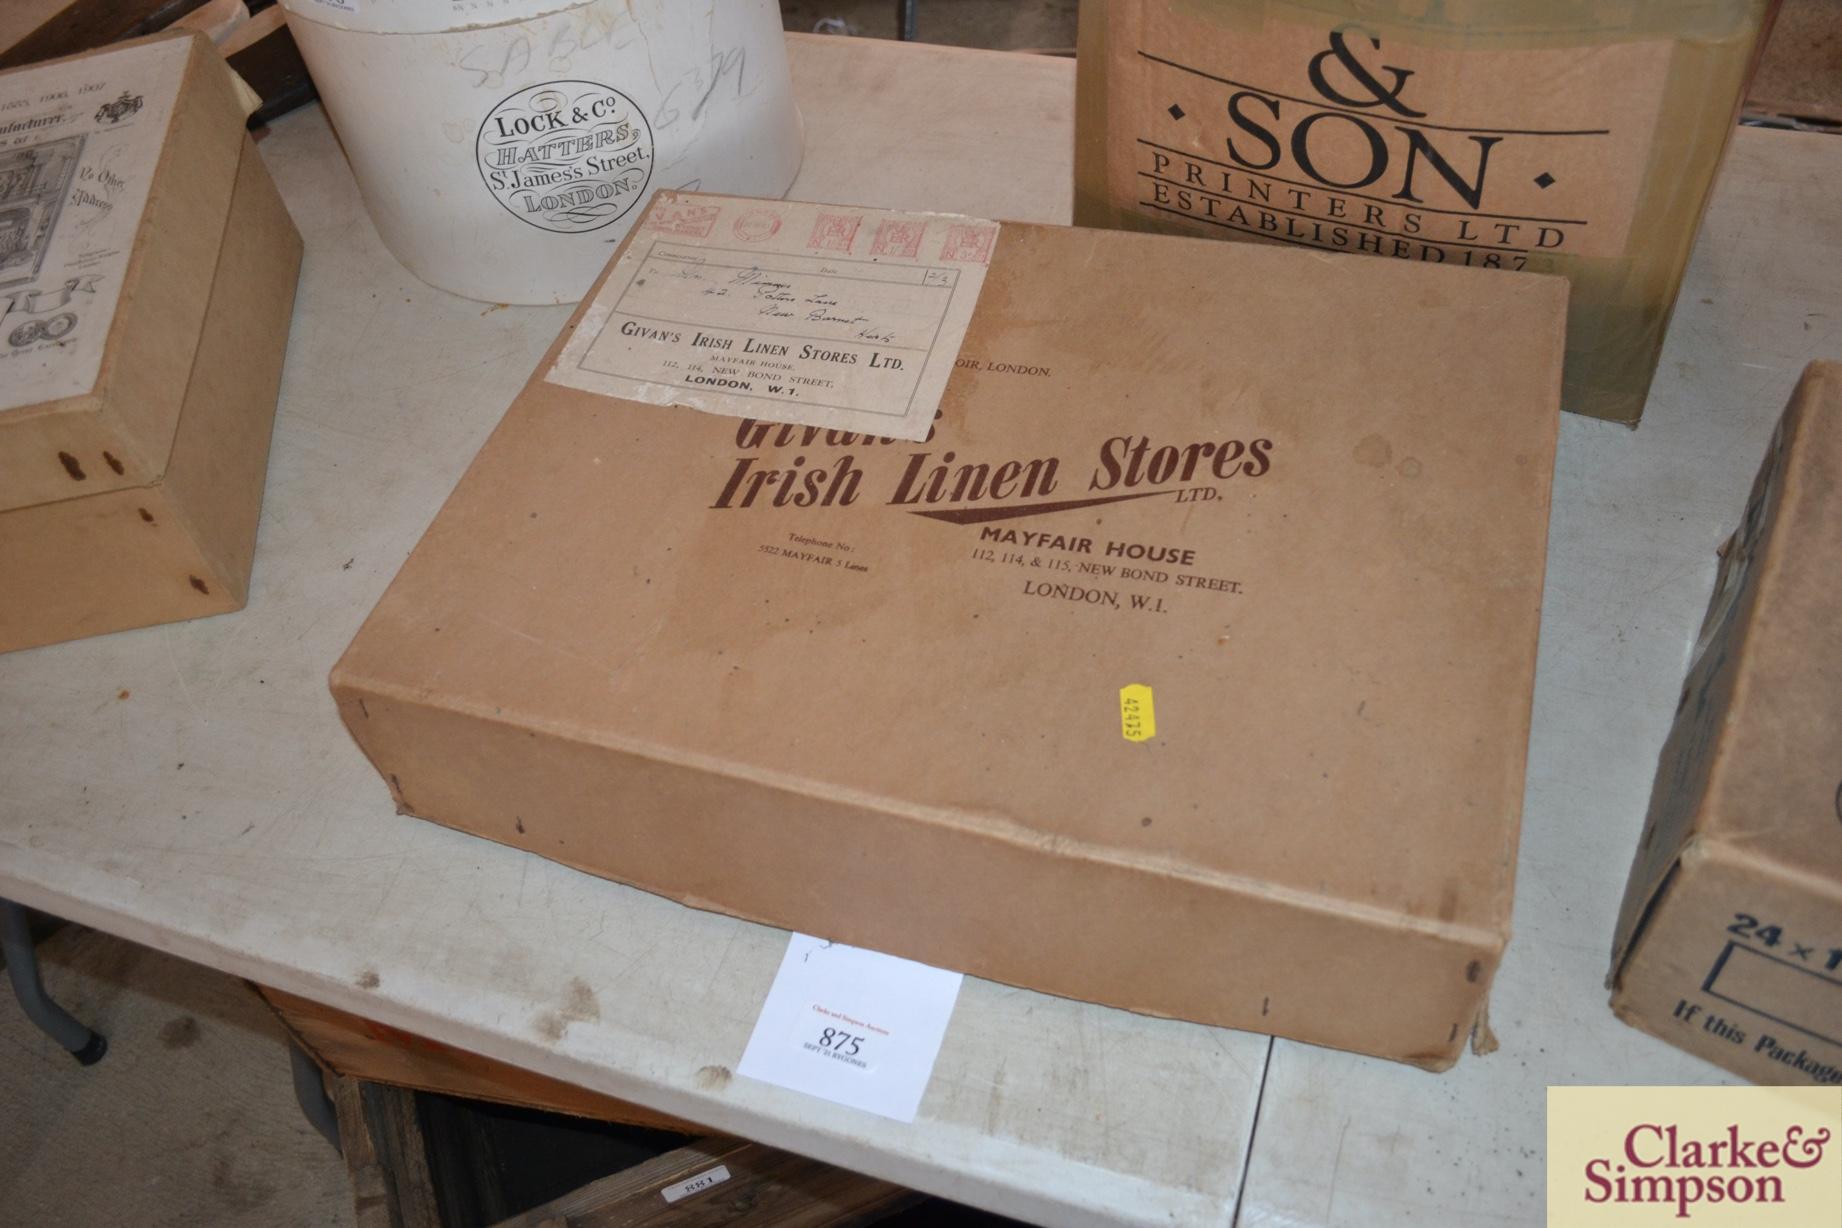 An advertising cardboard box for Girvans Irish Lin